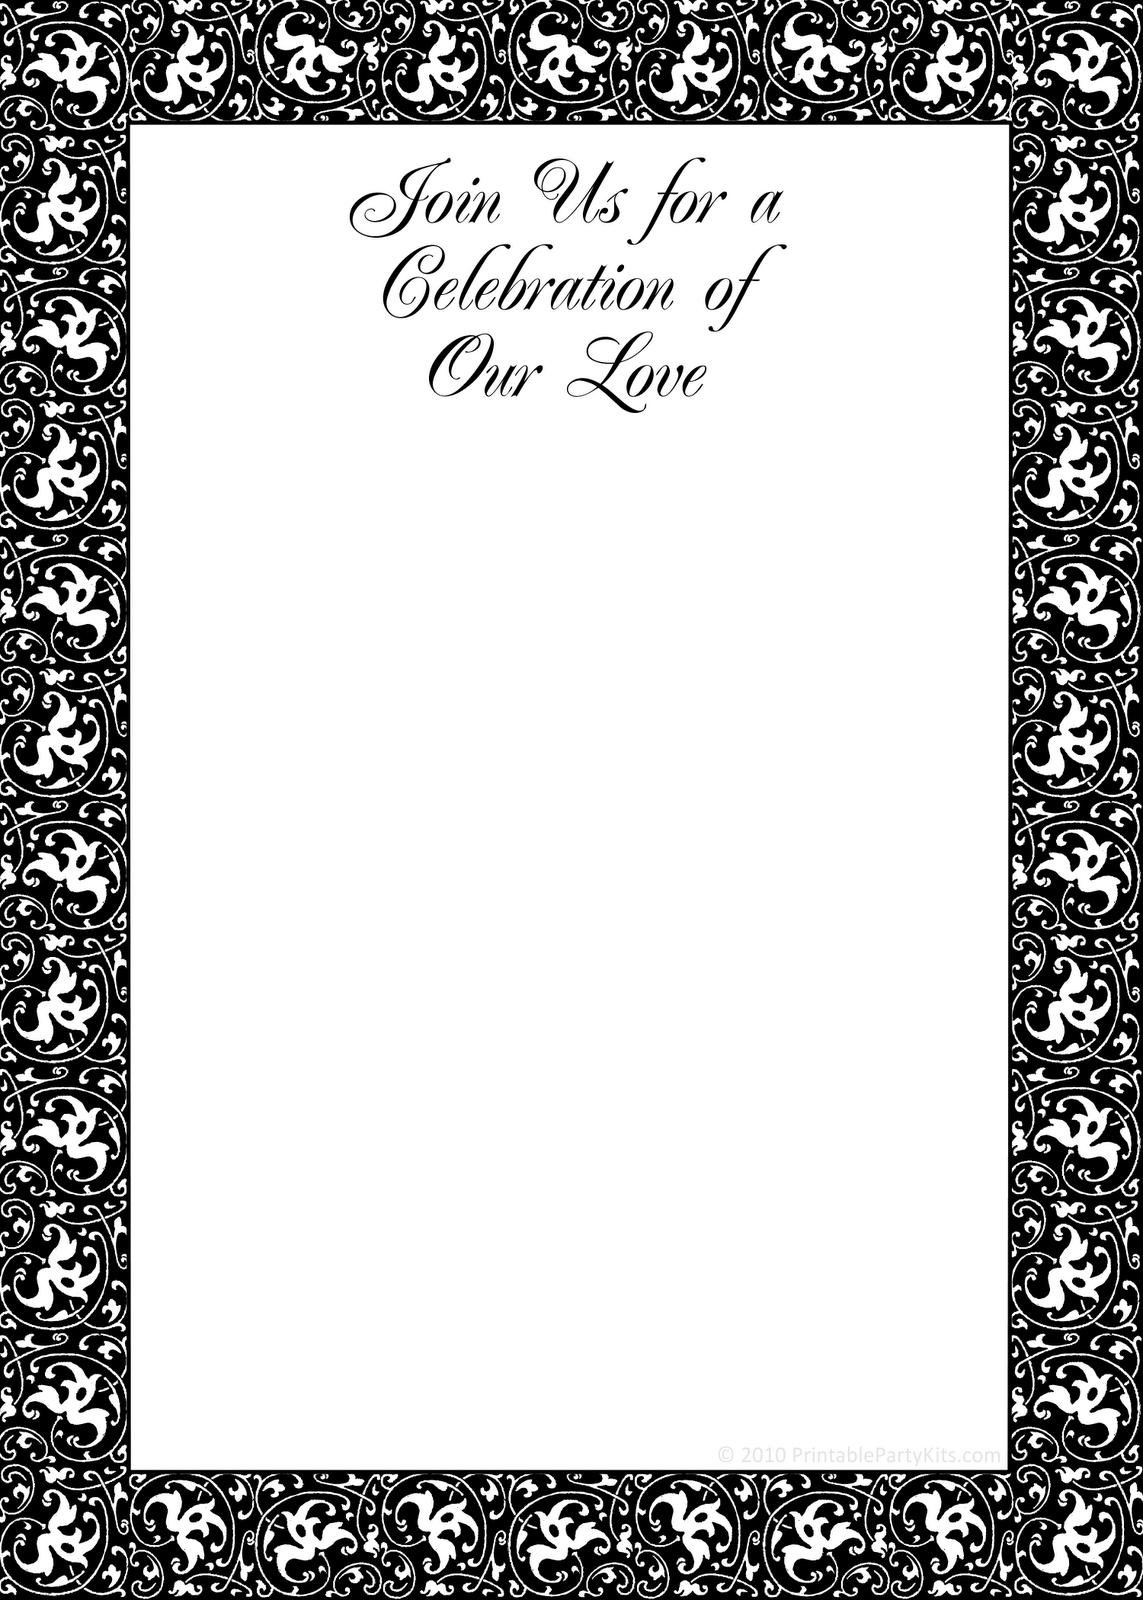 Free Printable Christmas Wedding Invitations Templates